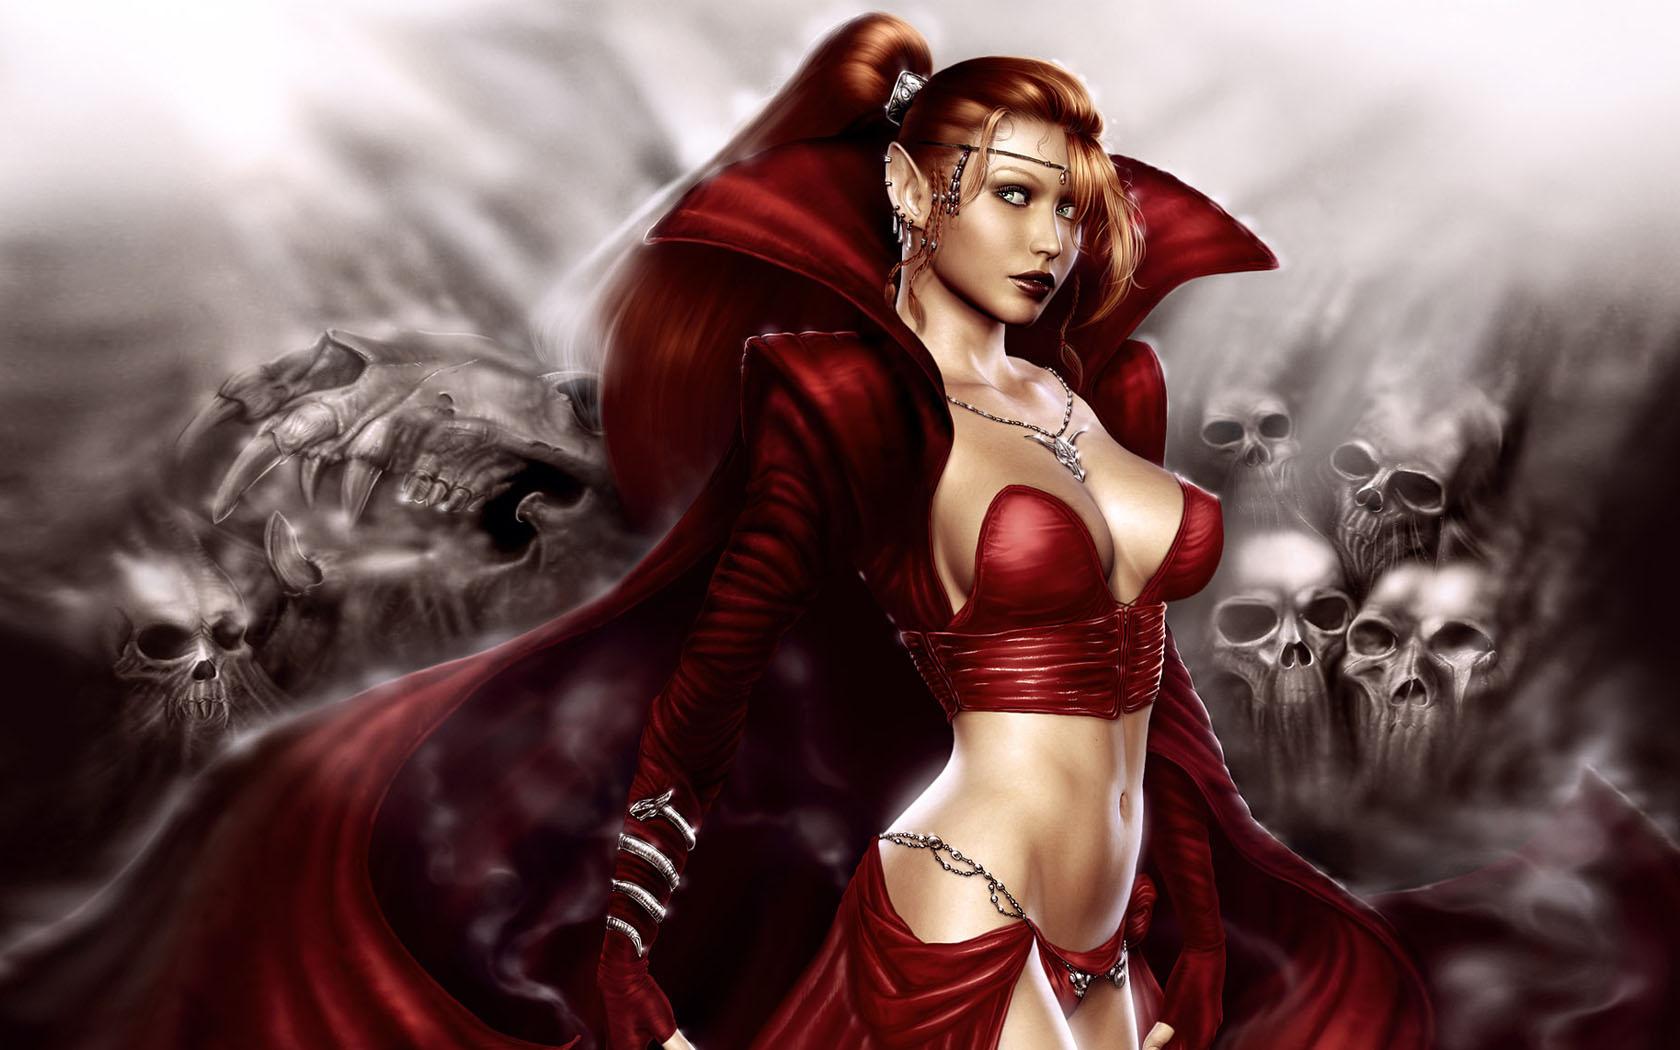 Fantasy art nude warrior babe pics porn pics